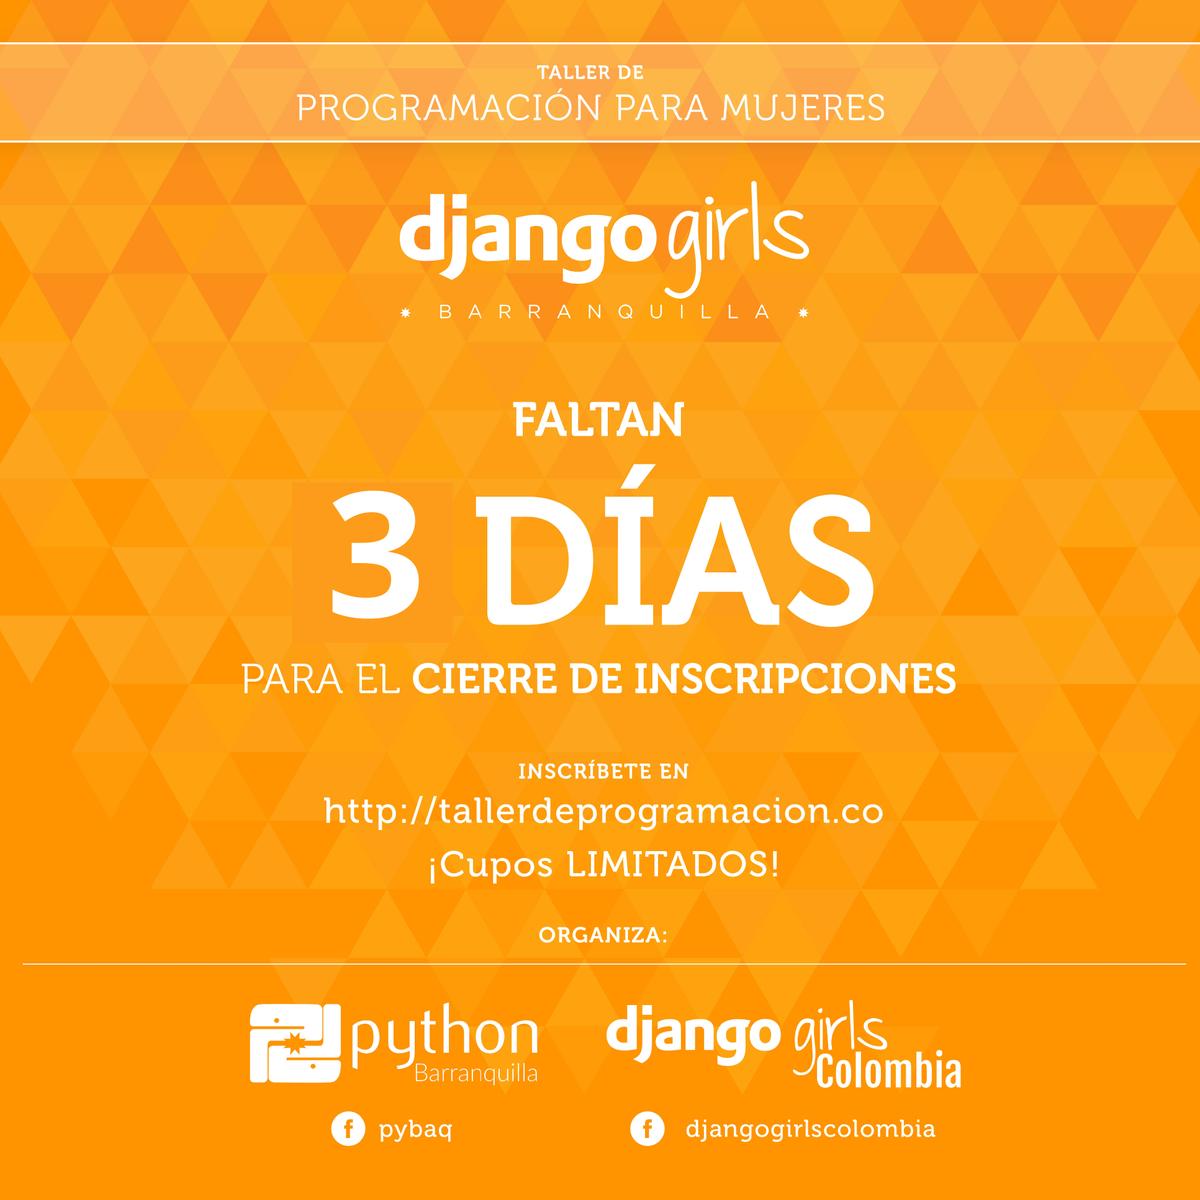 945058dd234f DjangoGirls Colombia on Twitter: